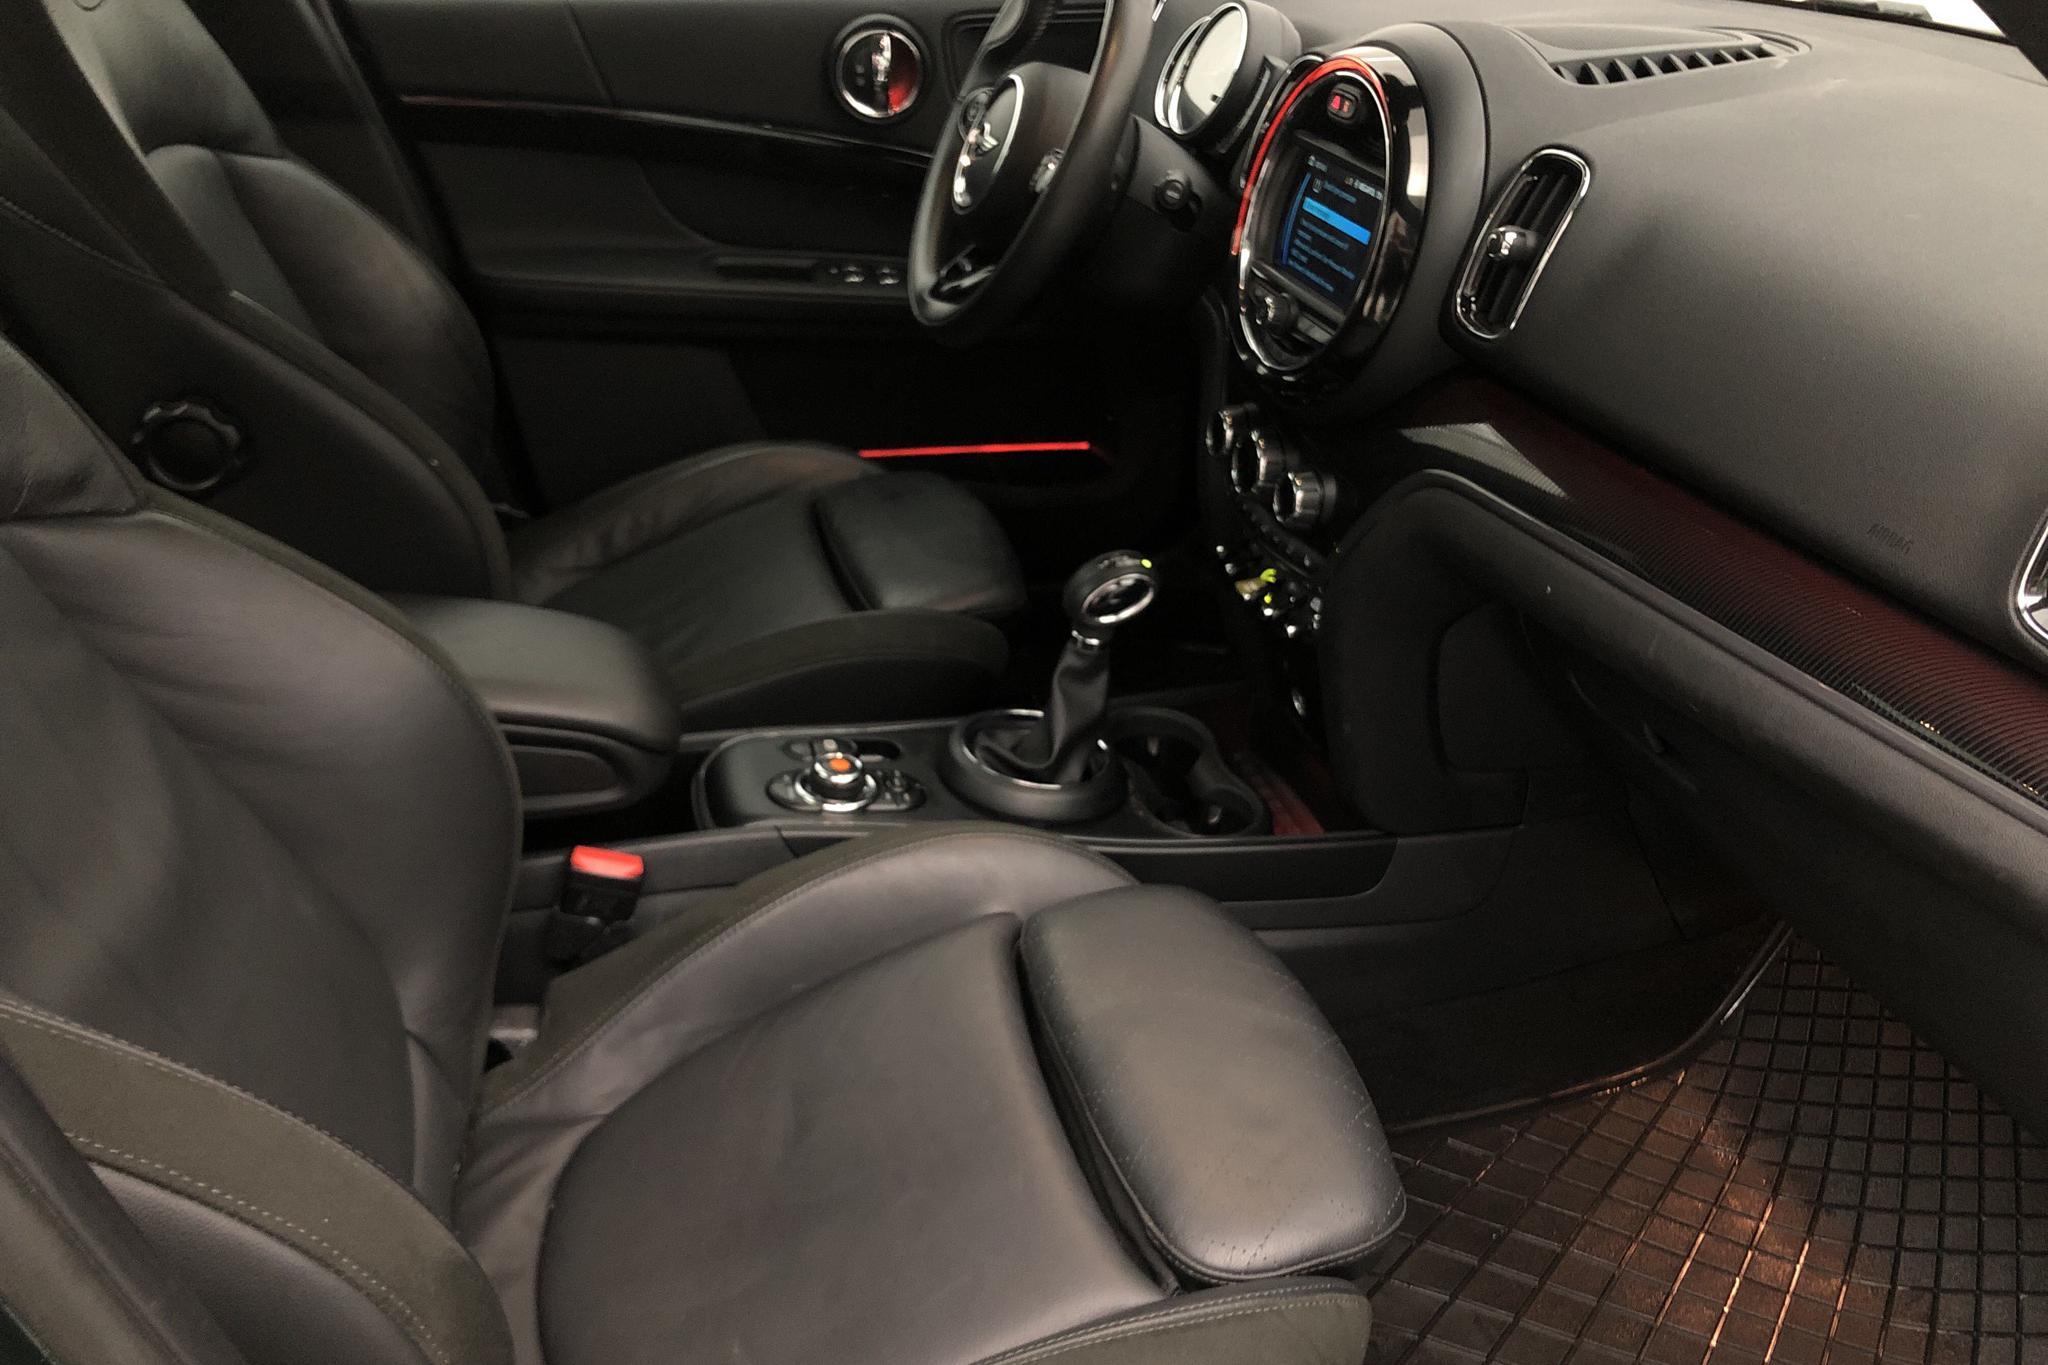 MINI Cooper S E ALL4 Countryman, F60 (224hk) - 0 mil - Automat - grön - 2019